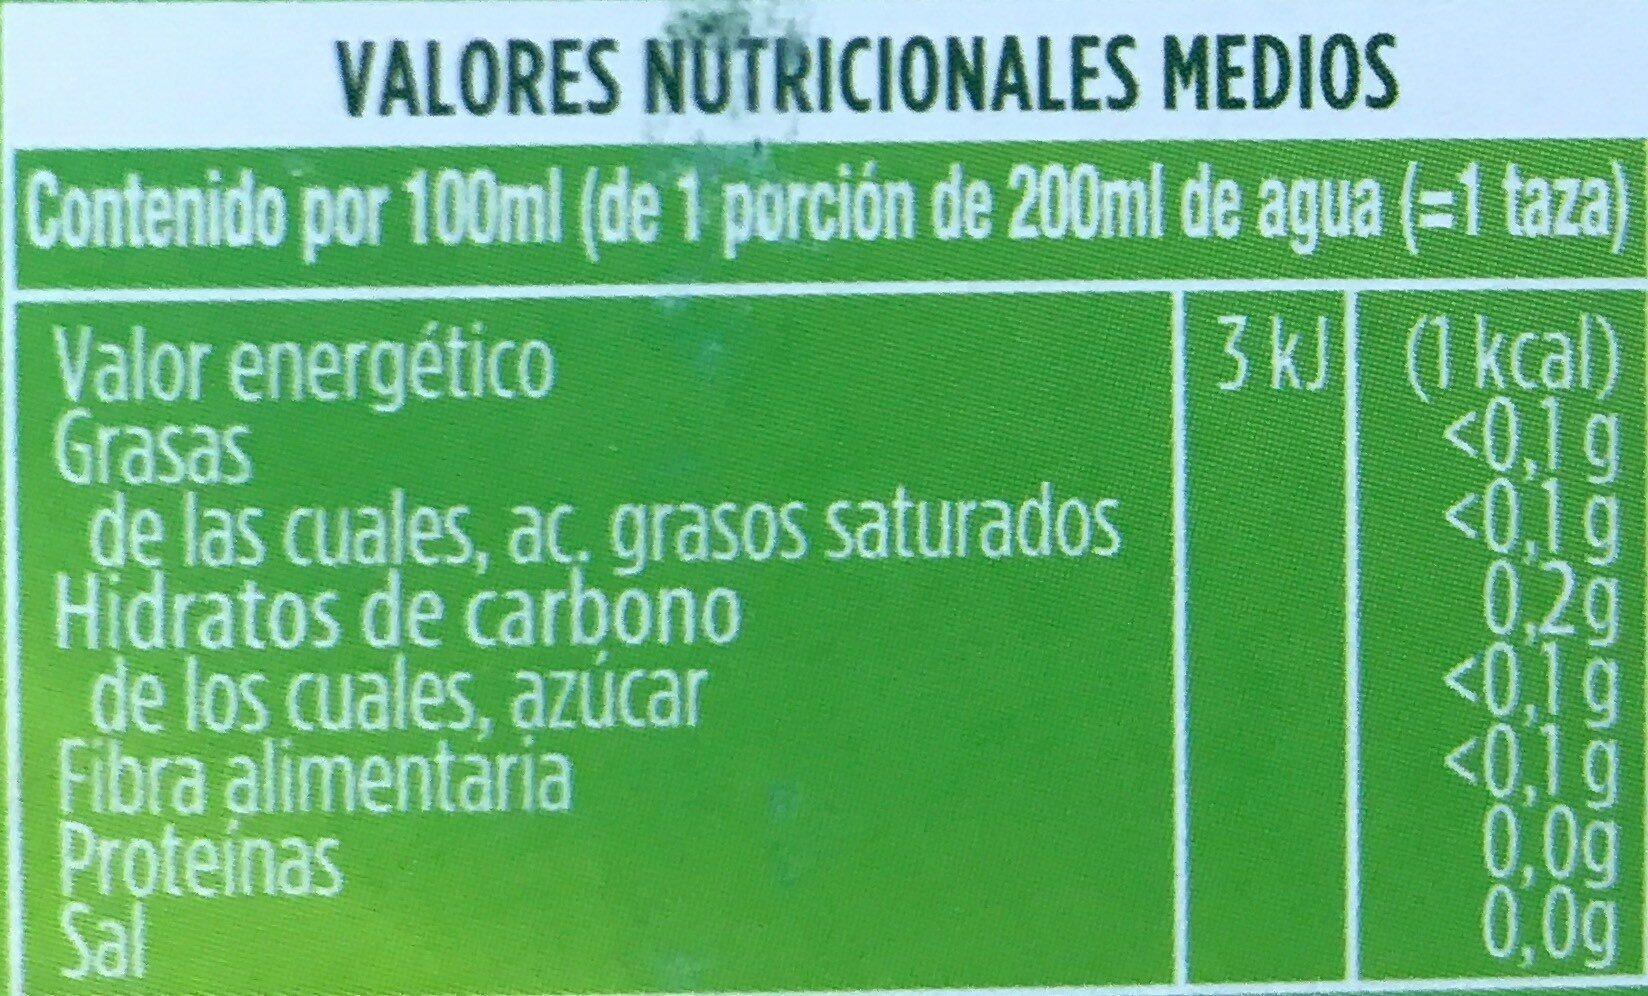 Digestive Infusión en cápsulas - Voedingswaarden